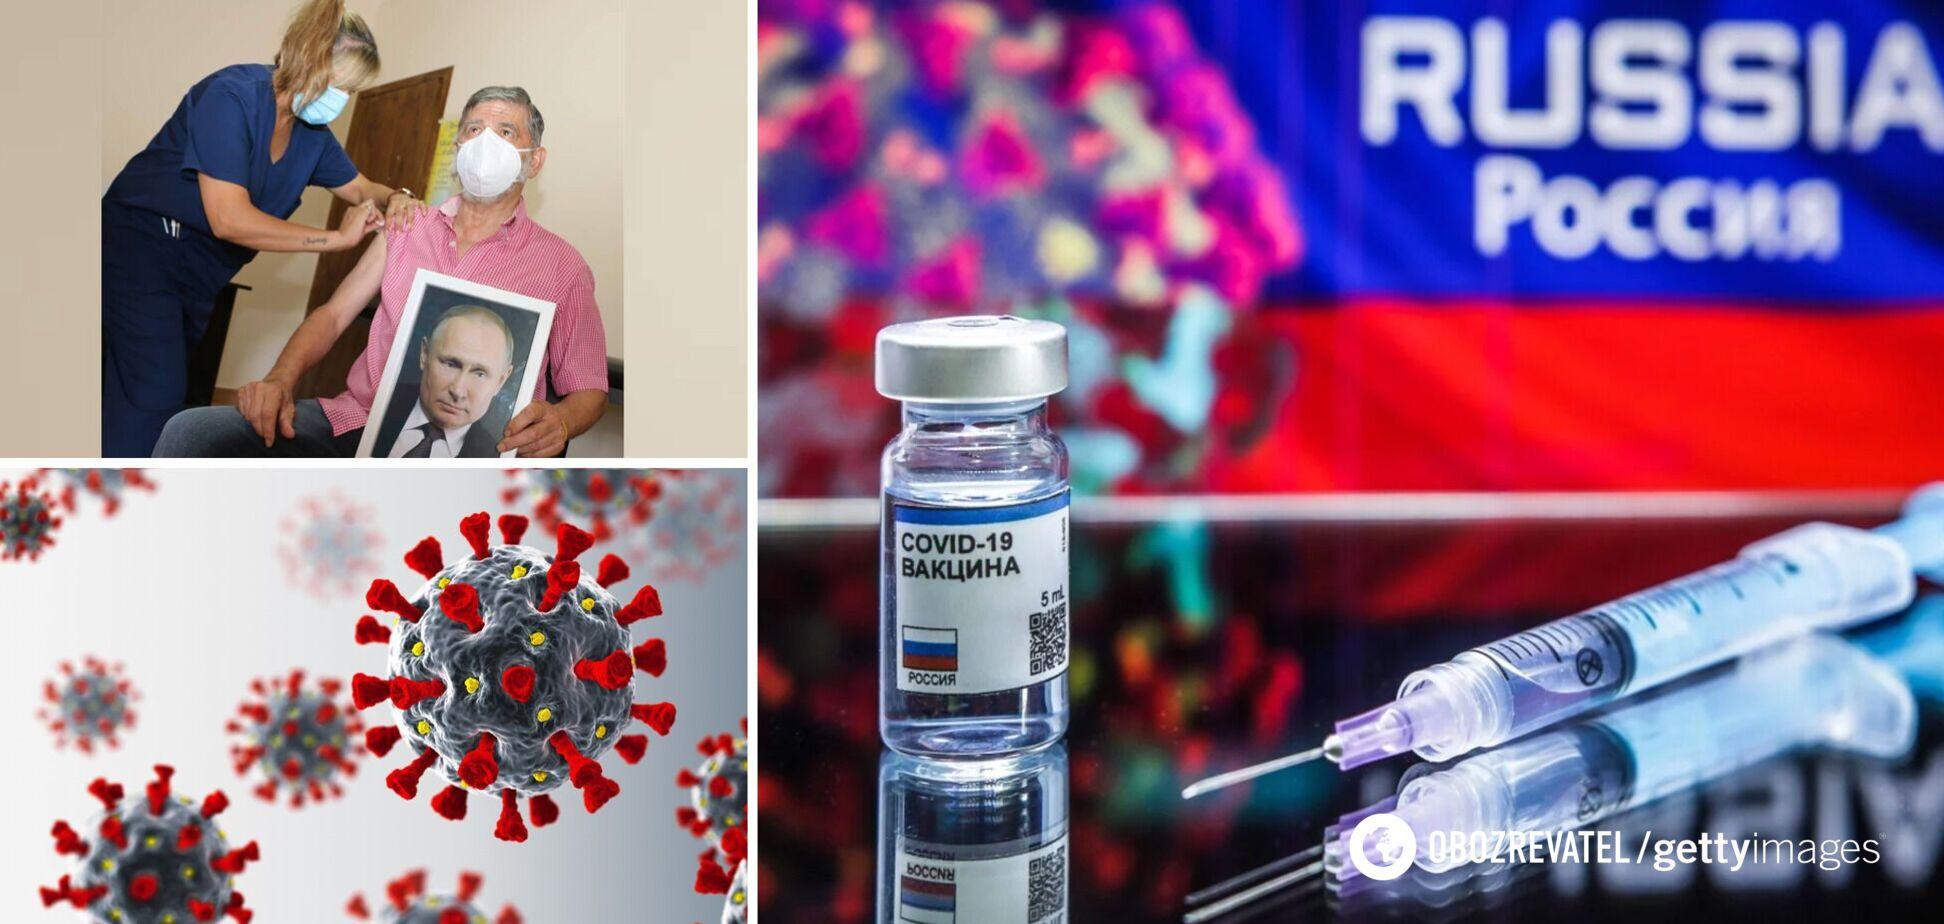 В Аргентине мэр привился от коронавируса с портретом Путина в руках